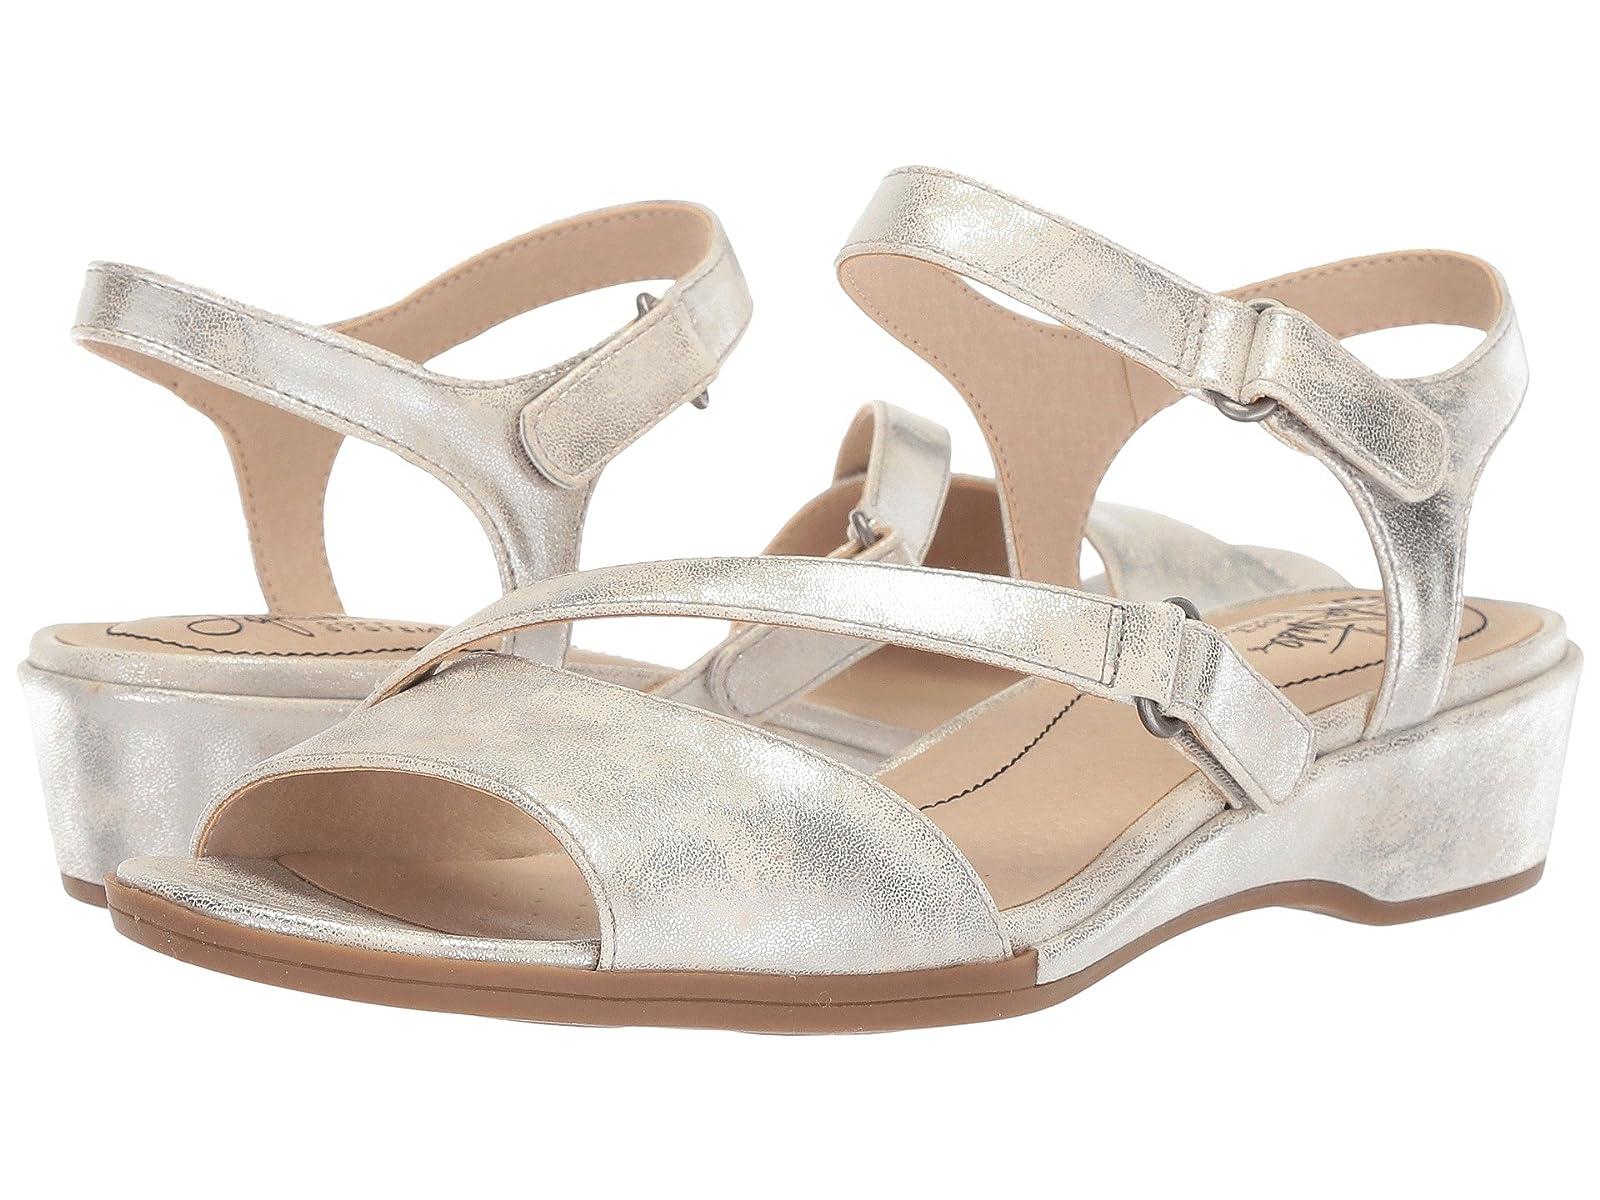 LifeStride MirandaAtmospheric grades have affordable shoes